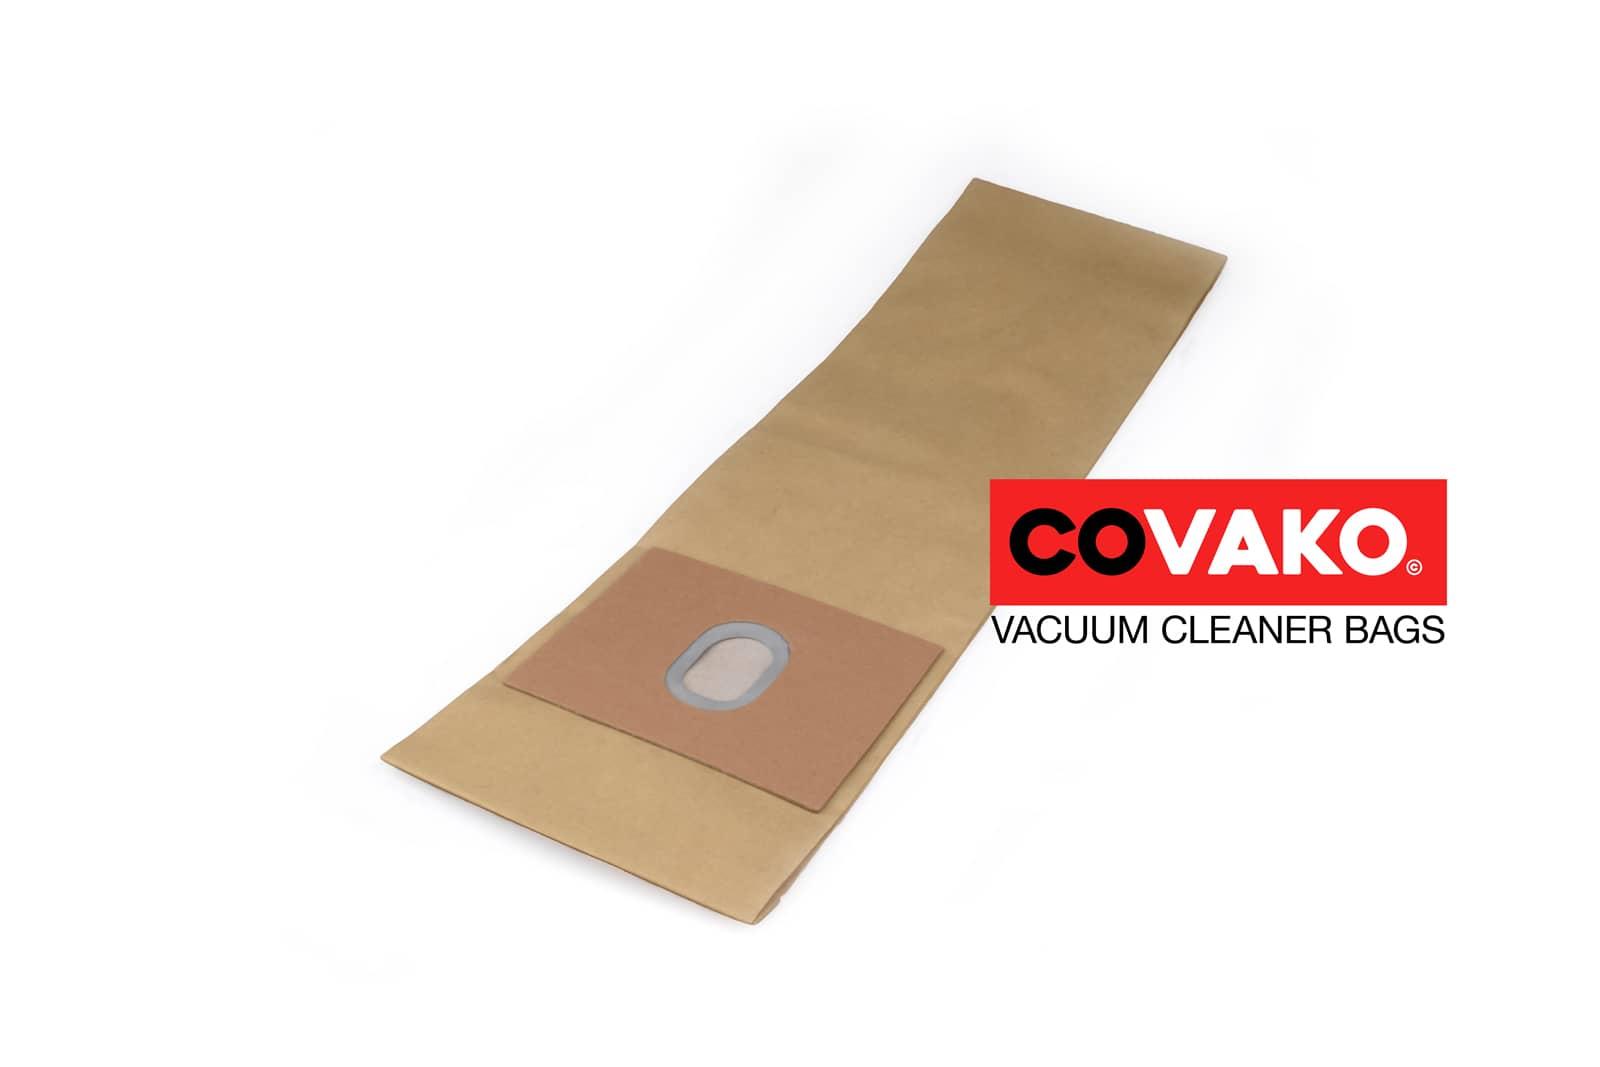 Nilco 171 / Papier - Nilco sacs d'aspirateur